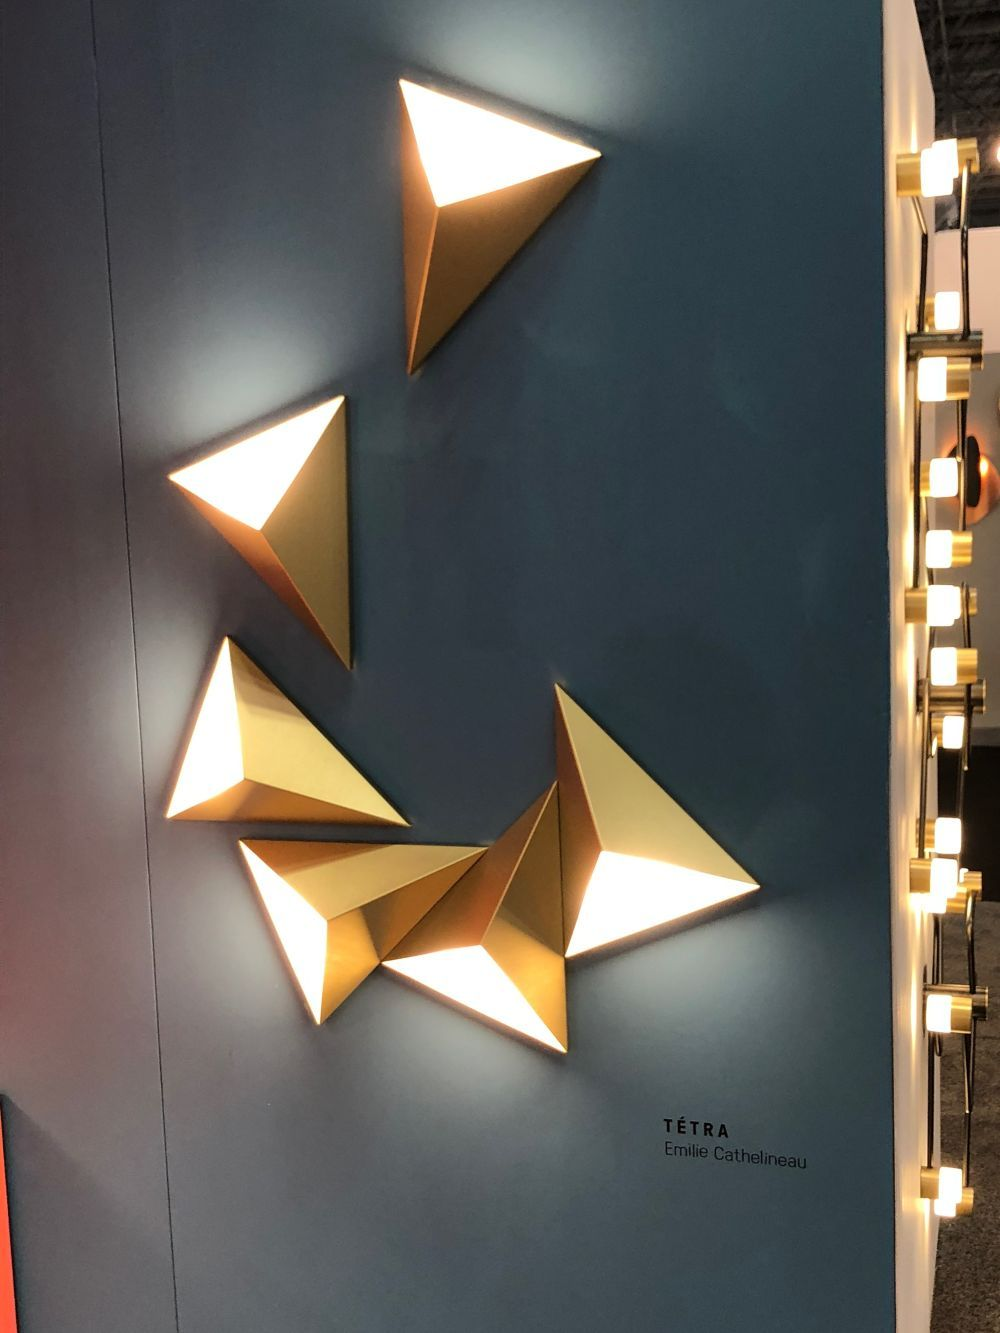 Tetra Triangle Wall Lights Wall Lighting Design Triangle Wall Lights Lamp Design